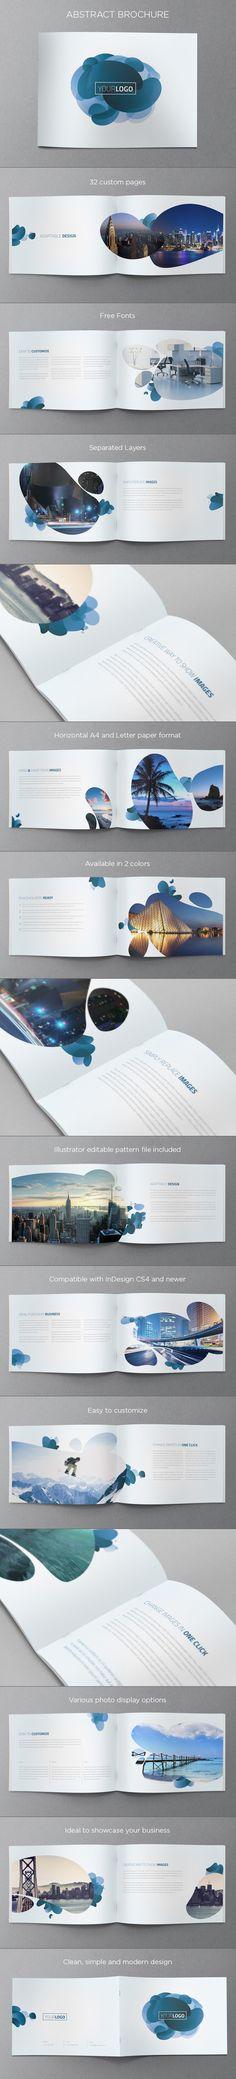 Abstract Modern Brochure